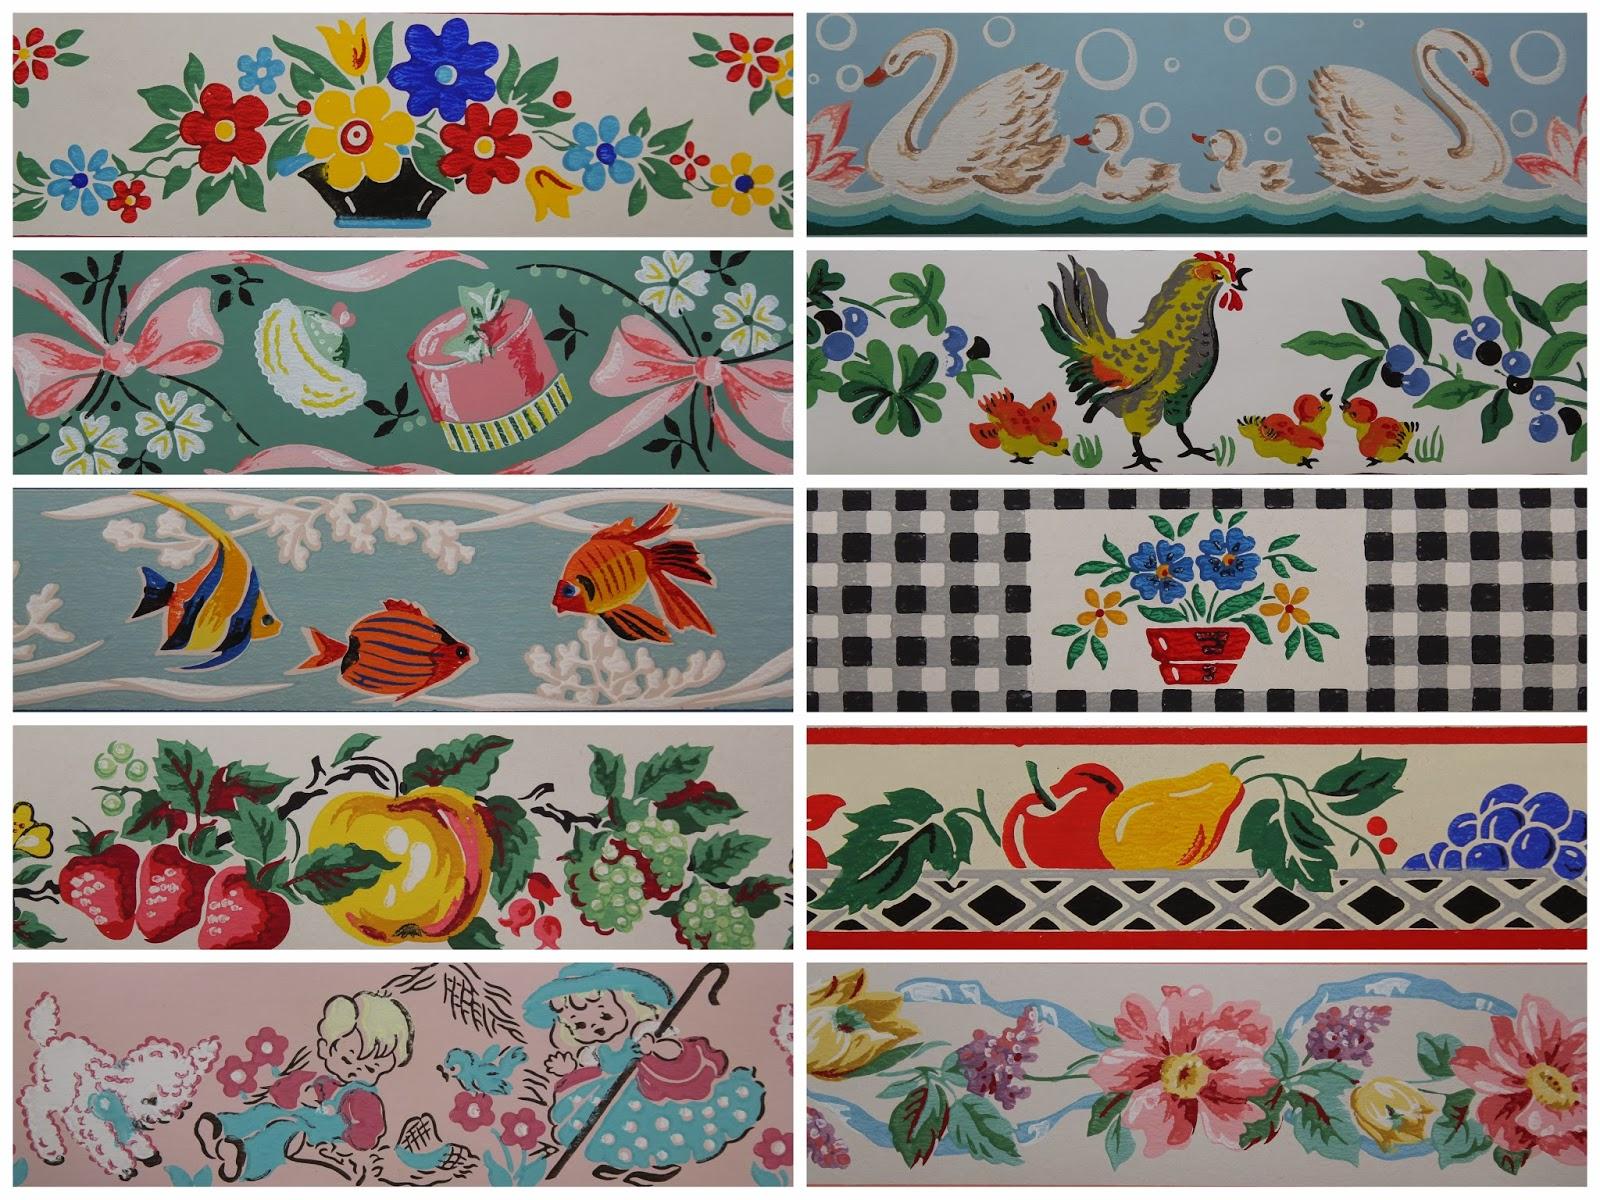 Brand new Rosie's Vintage Wallpaper: Rosie's Vintage Wallpaper is Your Best  QG06